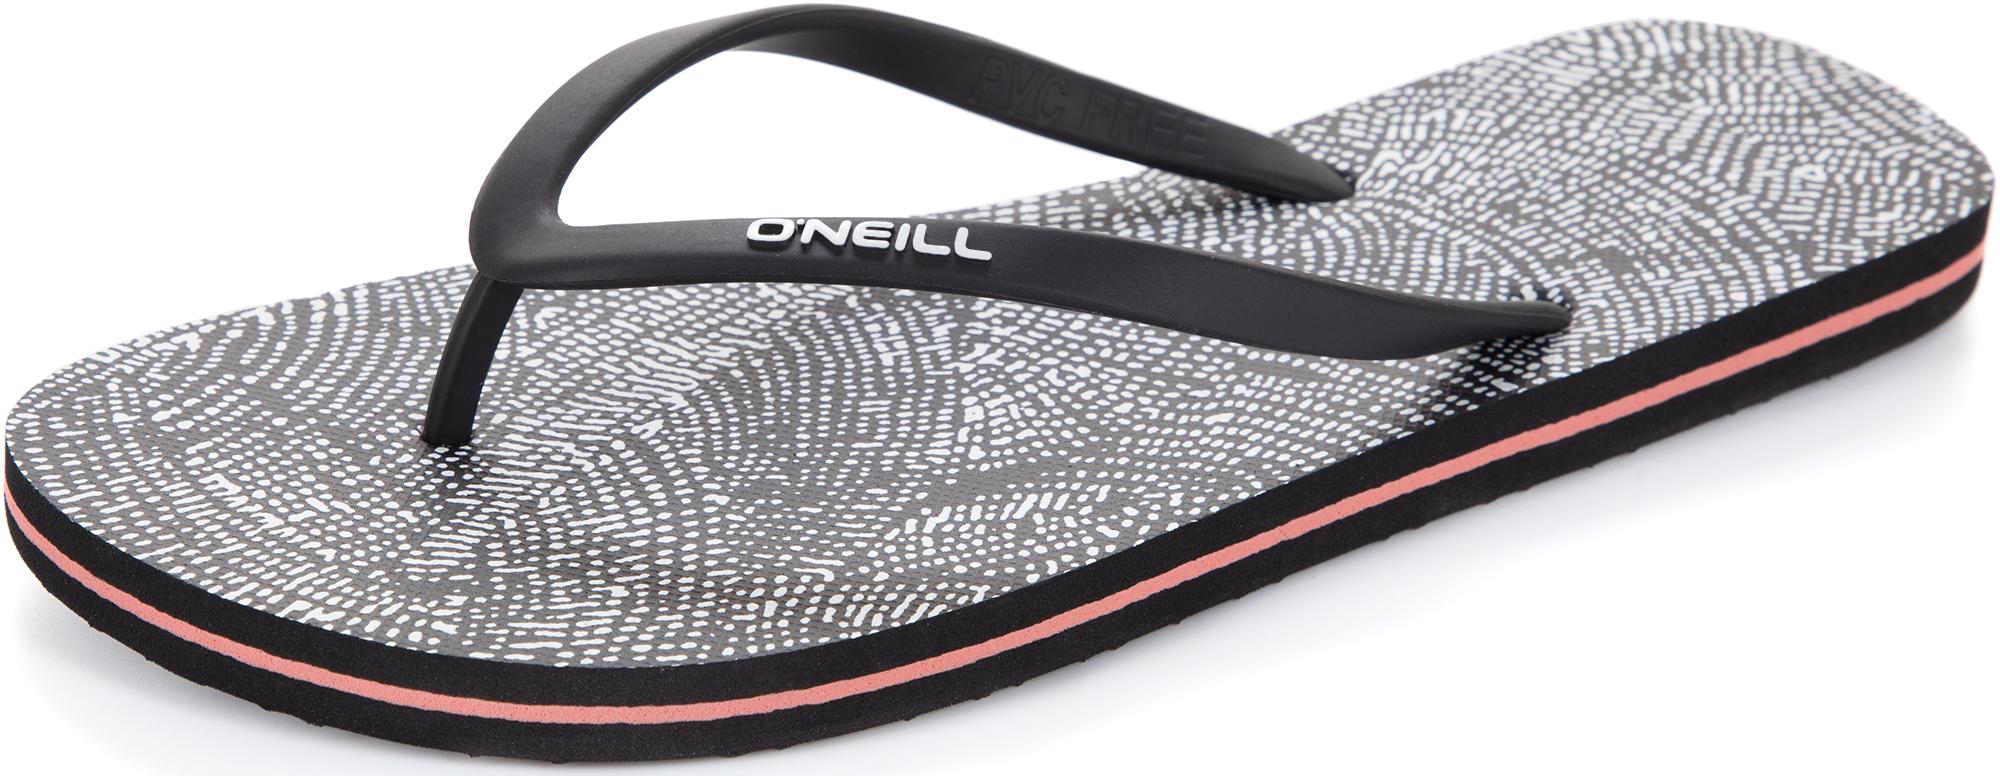 O'Neill Шлепанцы женские O'Neill, размер 40